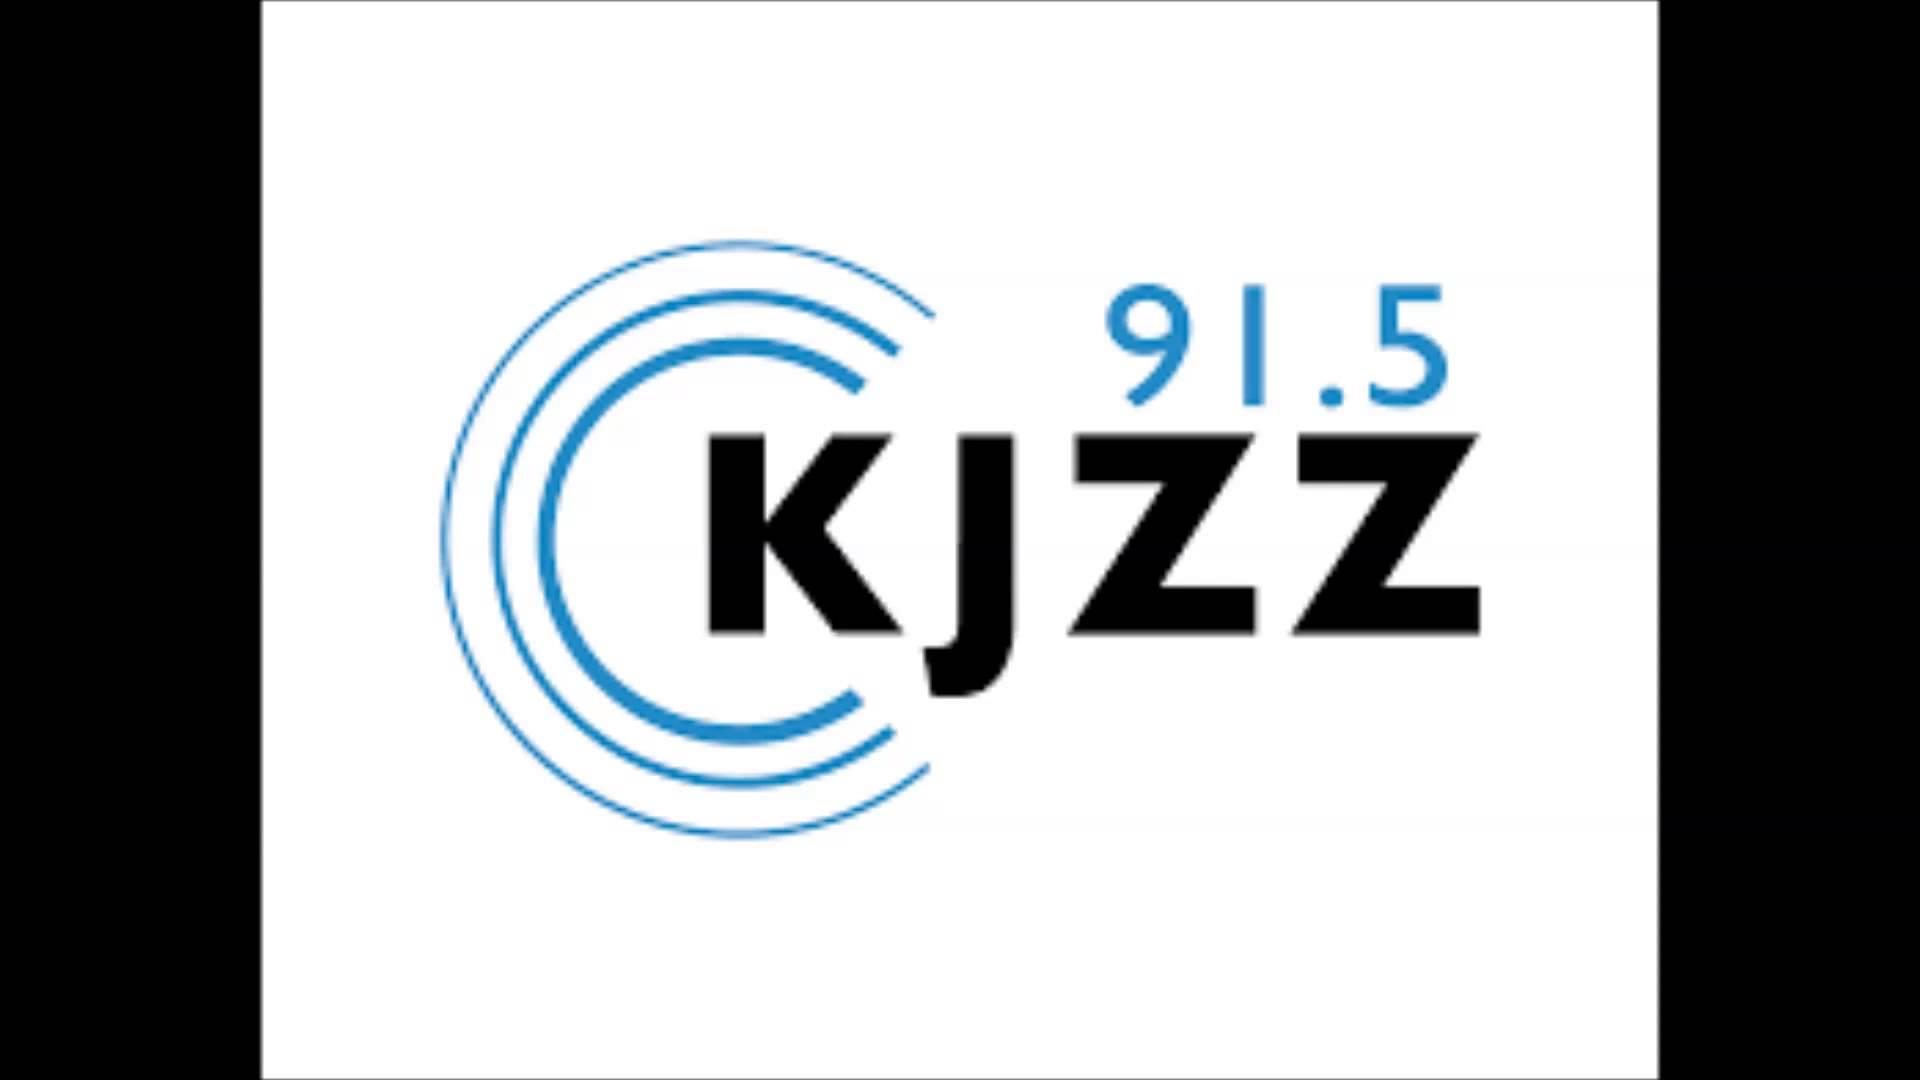 State-Election-Director-talks-about-dark-money-on-KJZZ